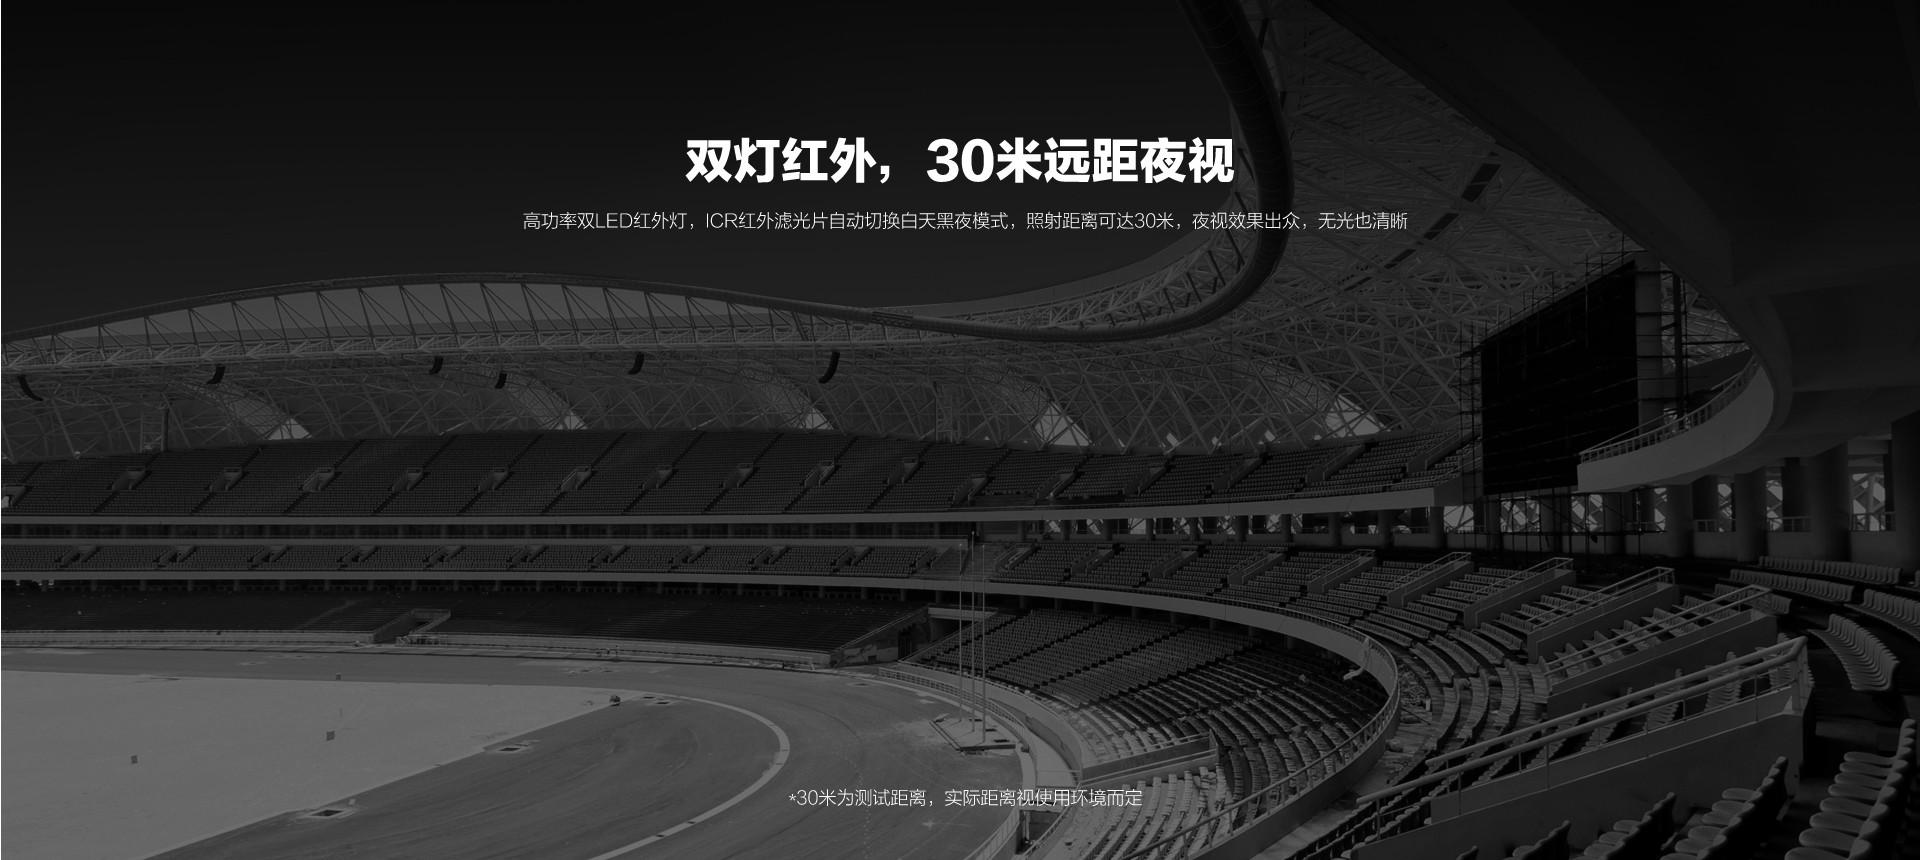 C3T+X5SC-web_10.jpg